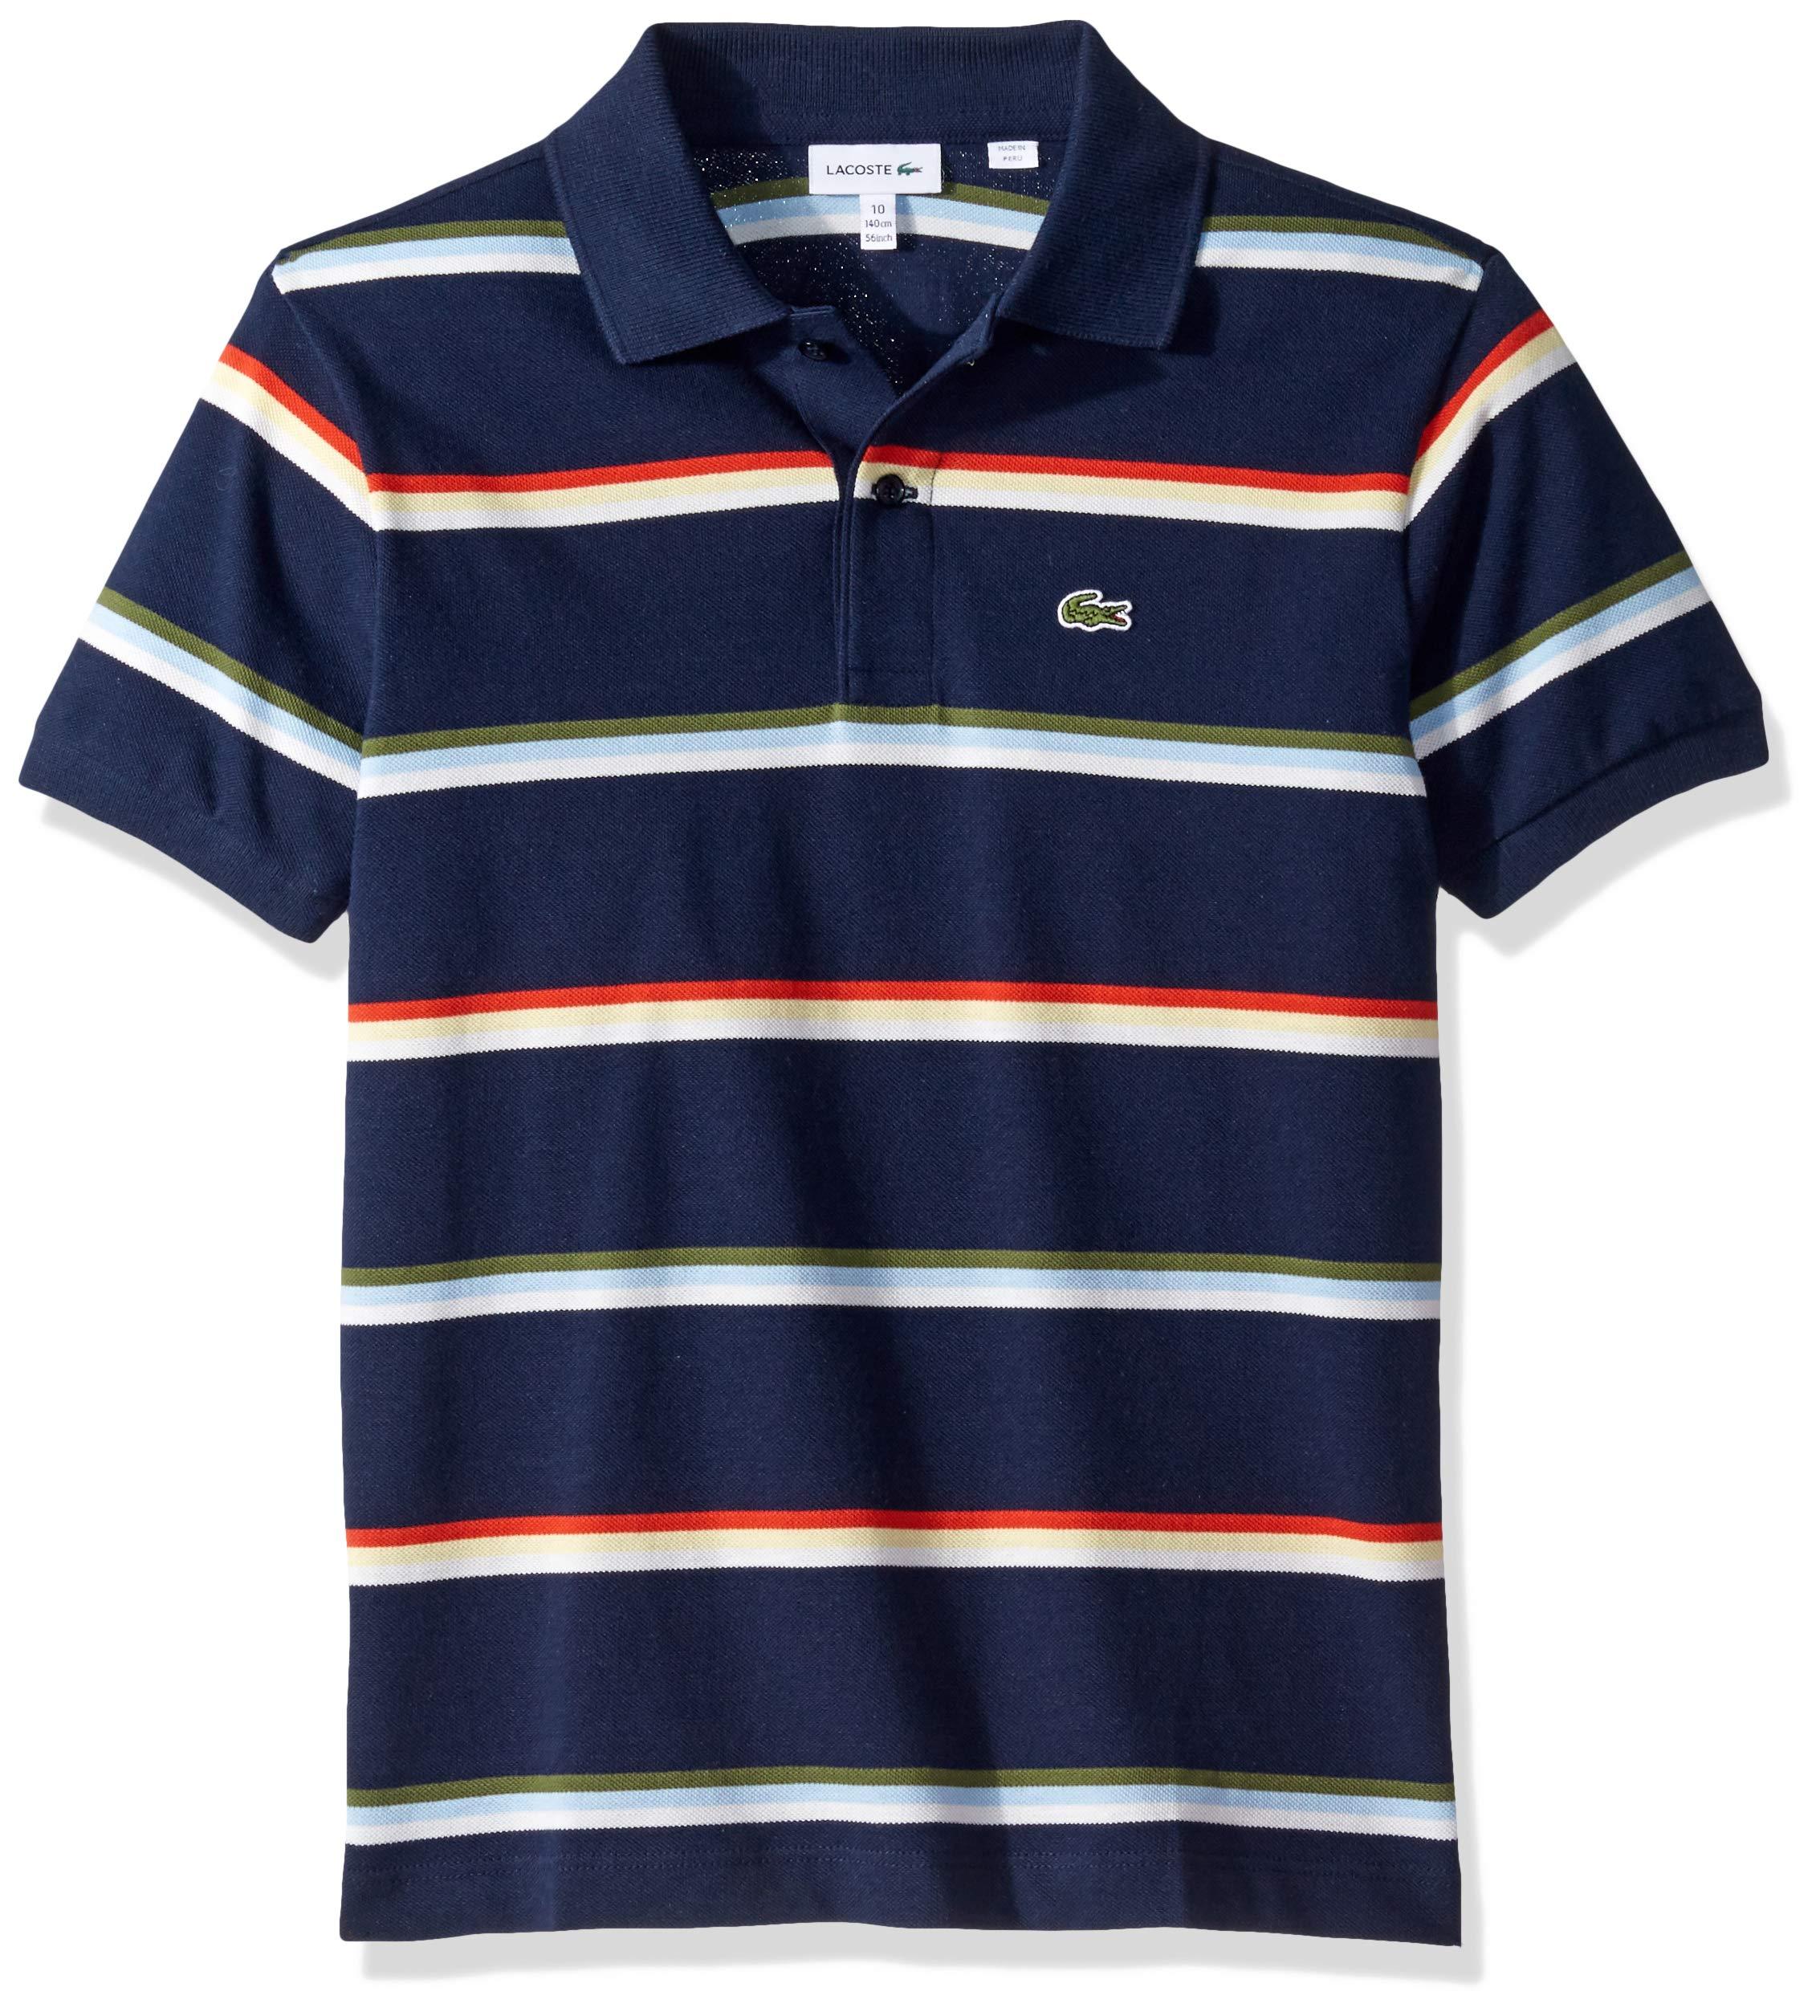 Lacoste Big BOY Summer Lover Striped Pique Polo, Navy Blue/Multi 14YR